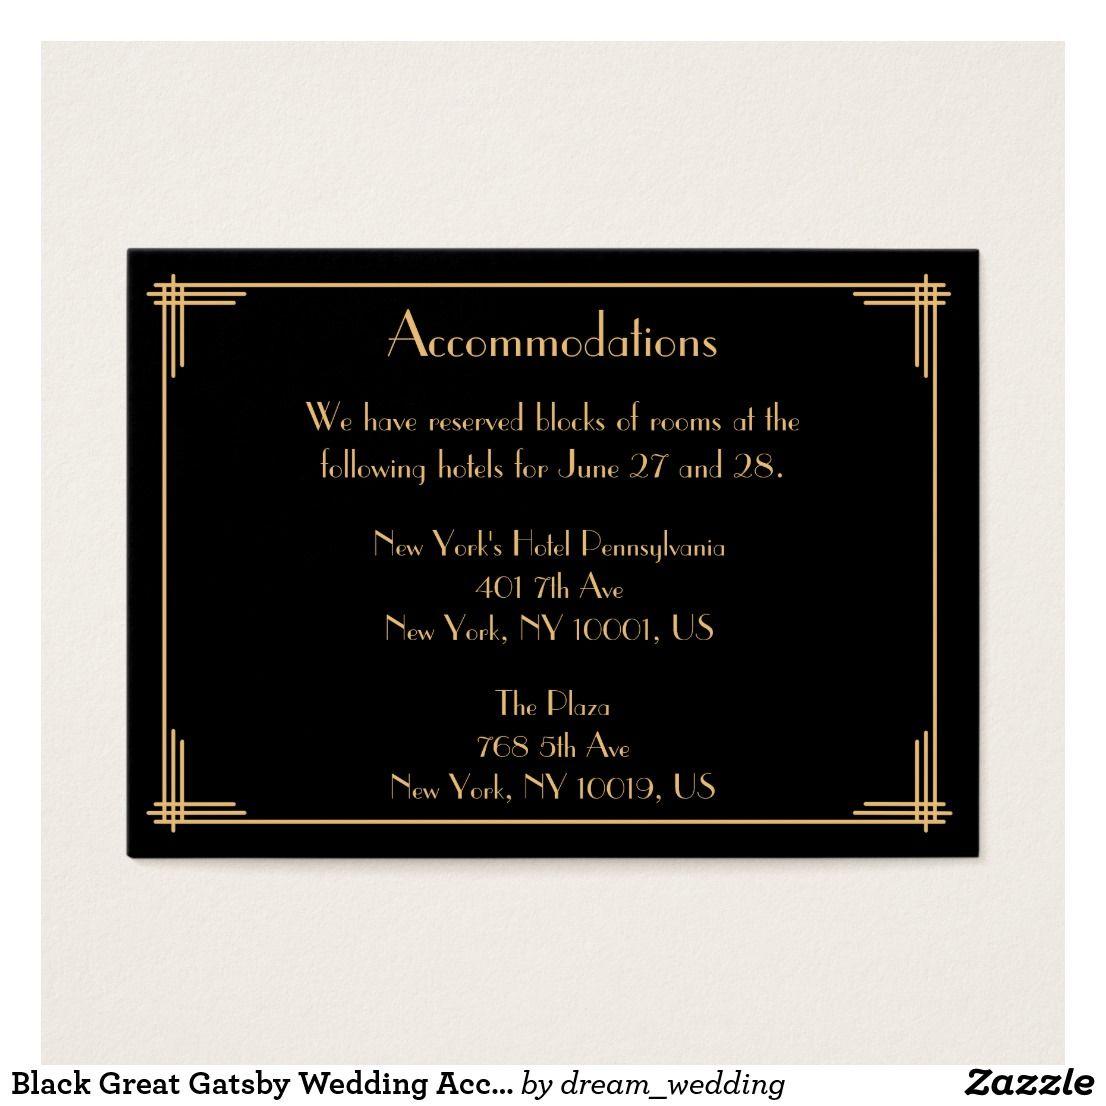 Black Great Gatsby Wedding Accommodation Cards Accommodations Card